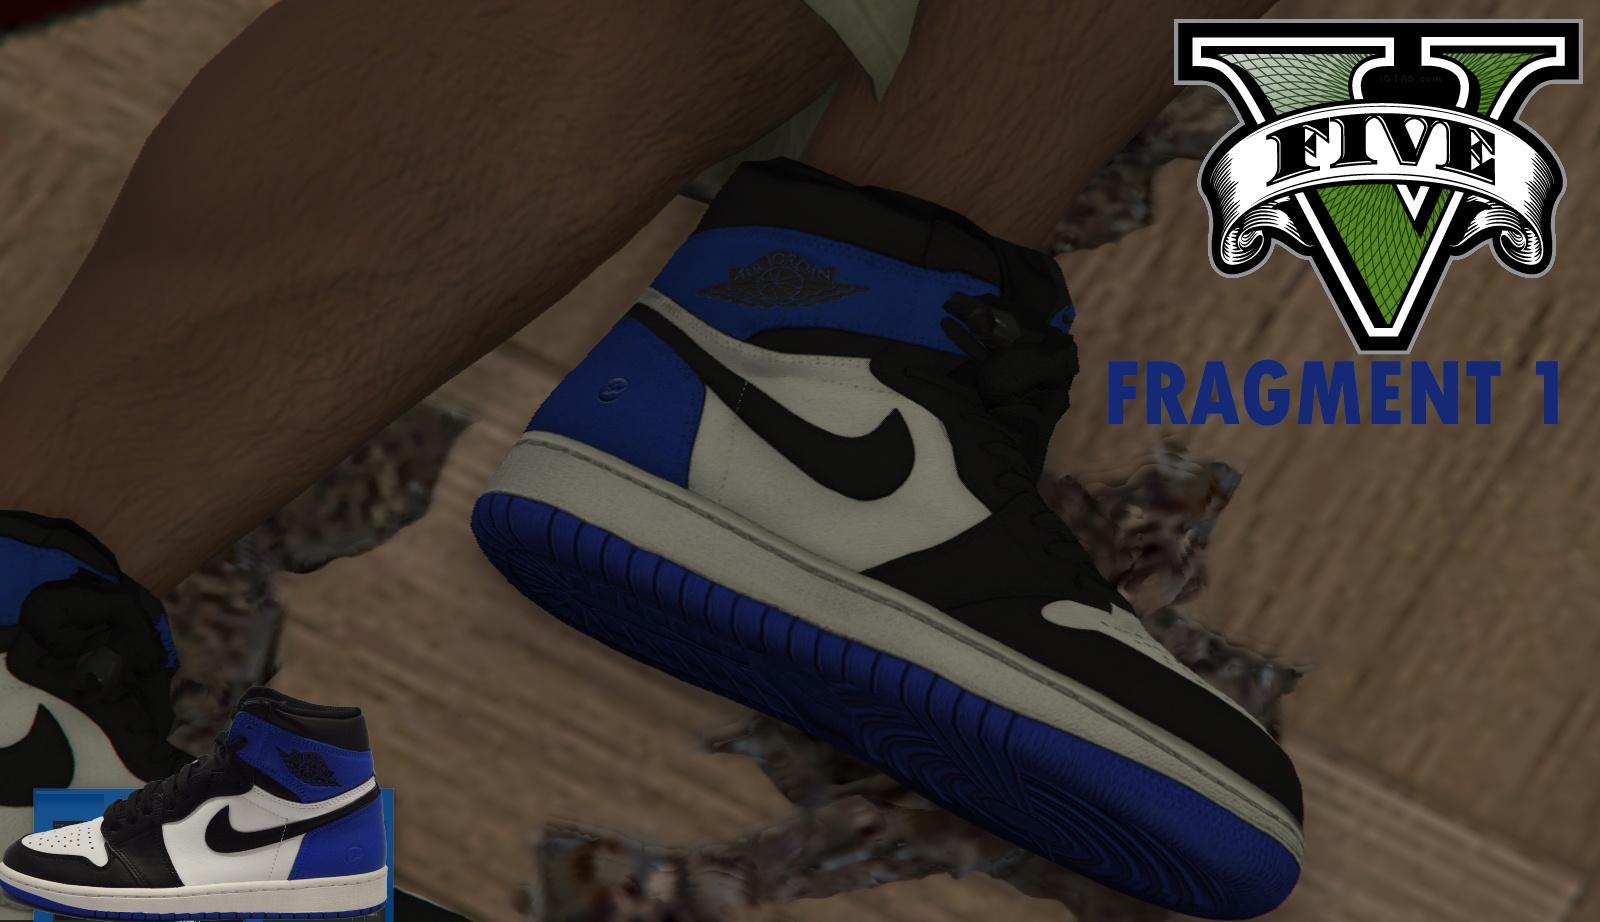 9cc5a136768b8c Air Jordan 1 Baron and Fragment reskins - GTA5-Mods.com